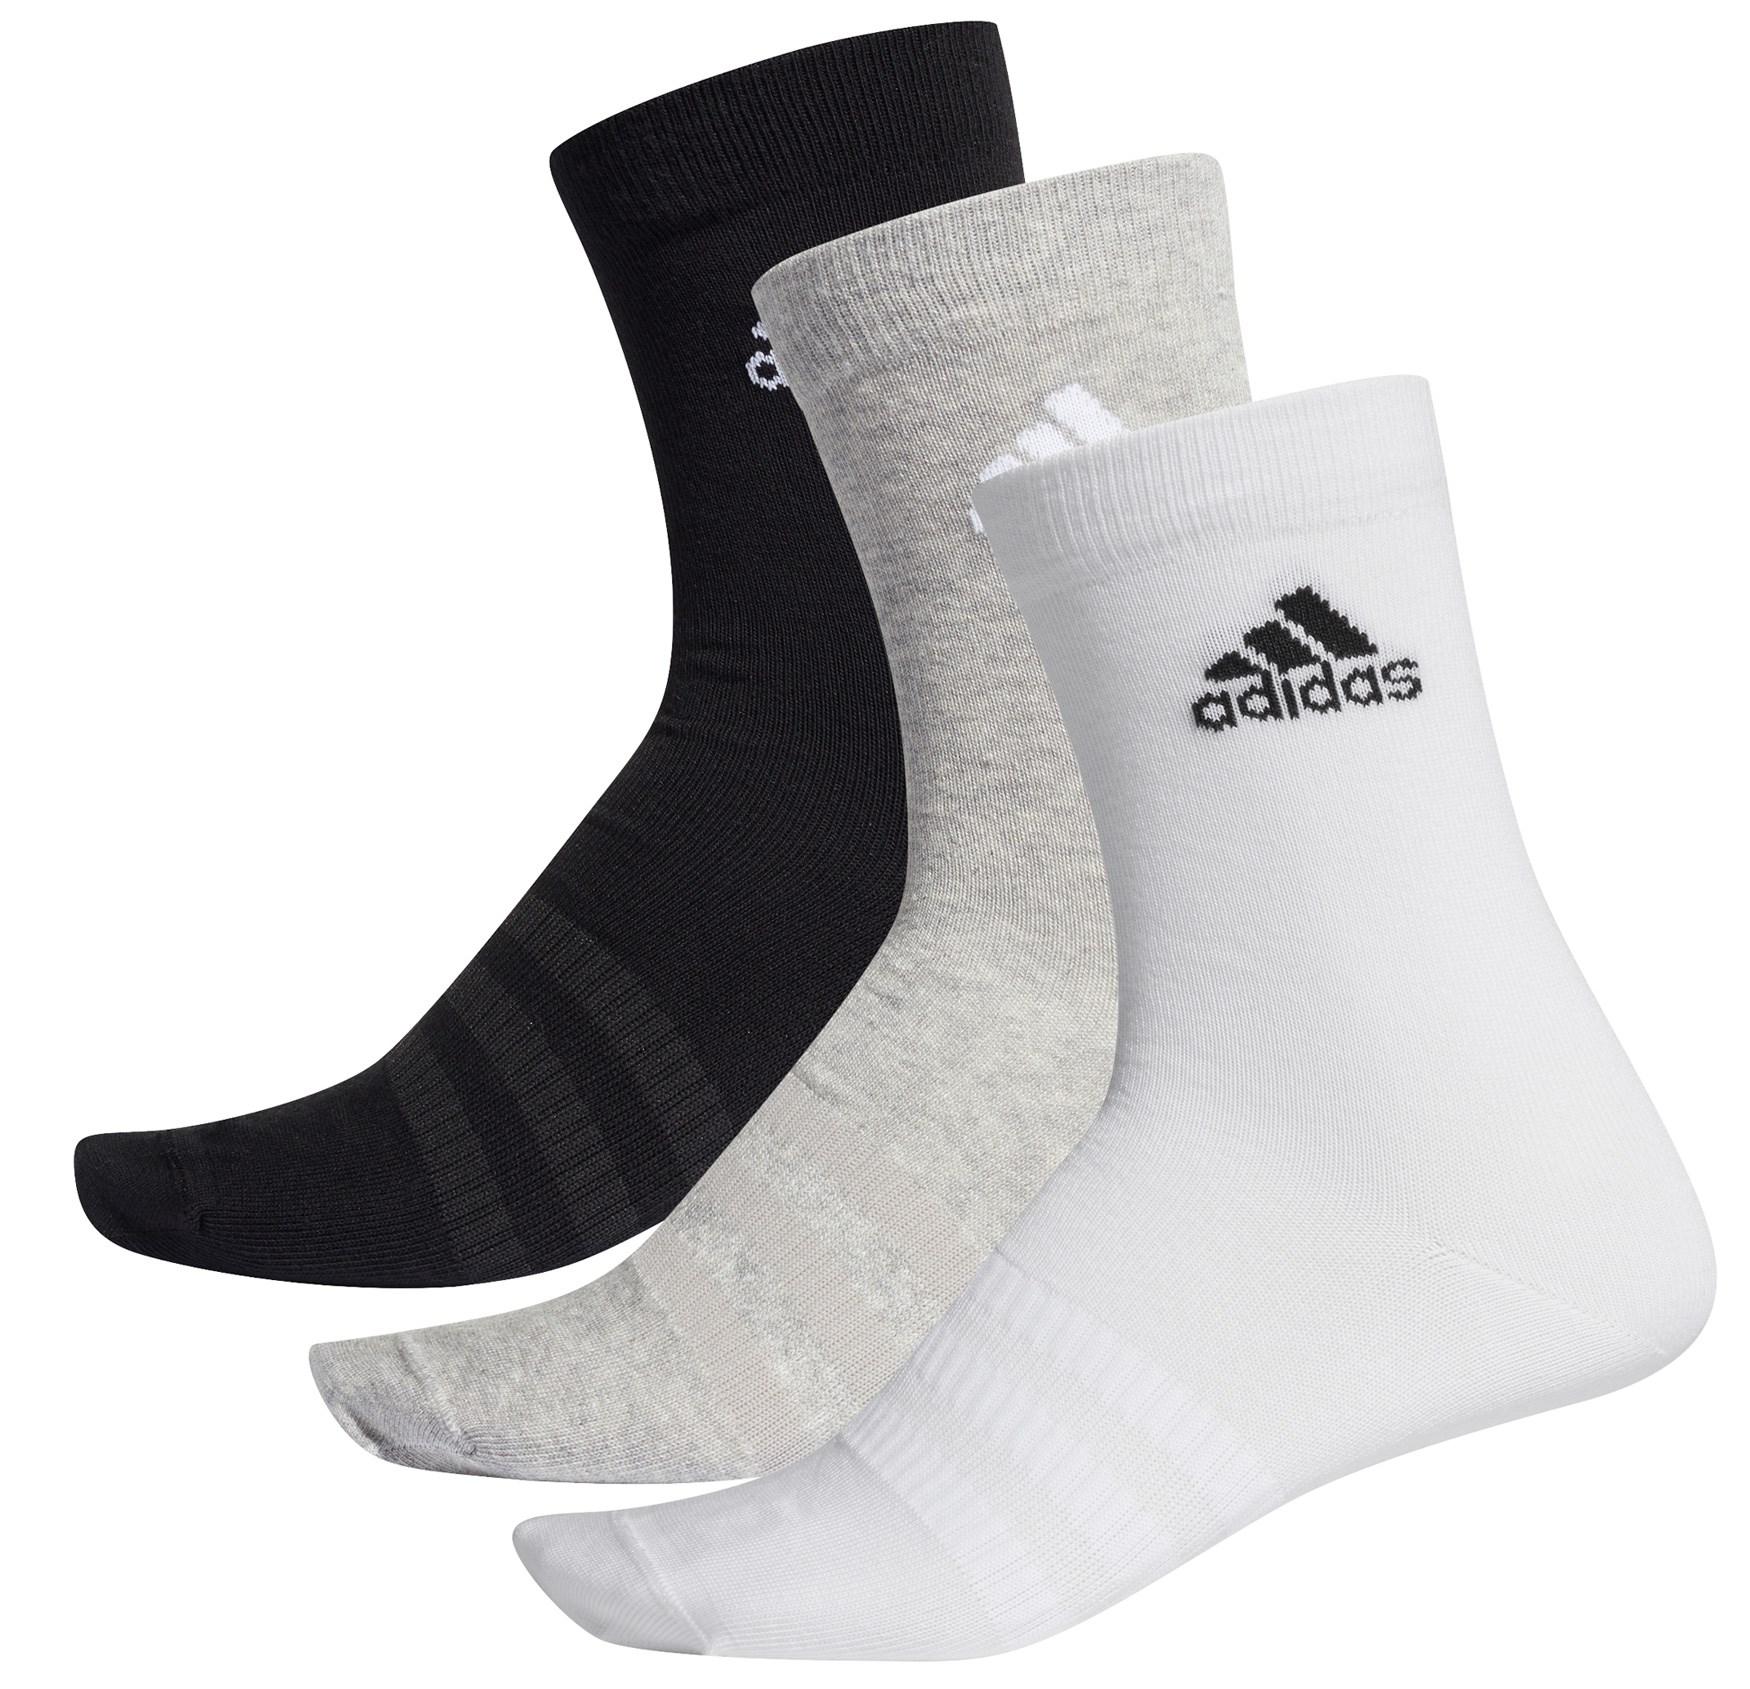 adidas Light Crew Socks 3 Pairs - medium grey heather/white/black DZ9392